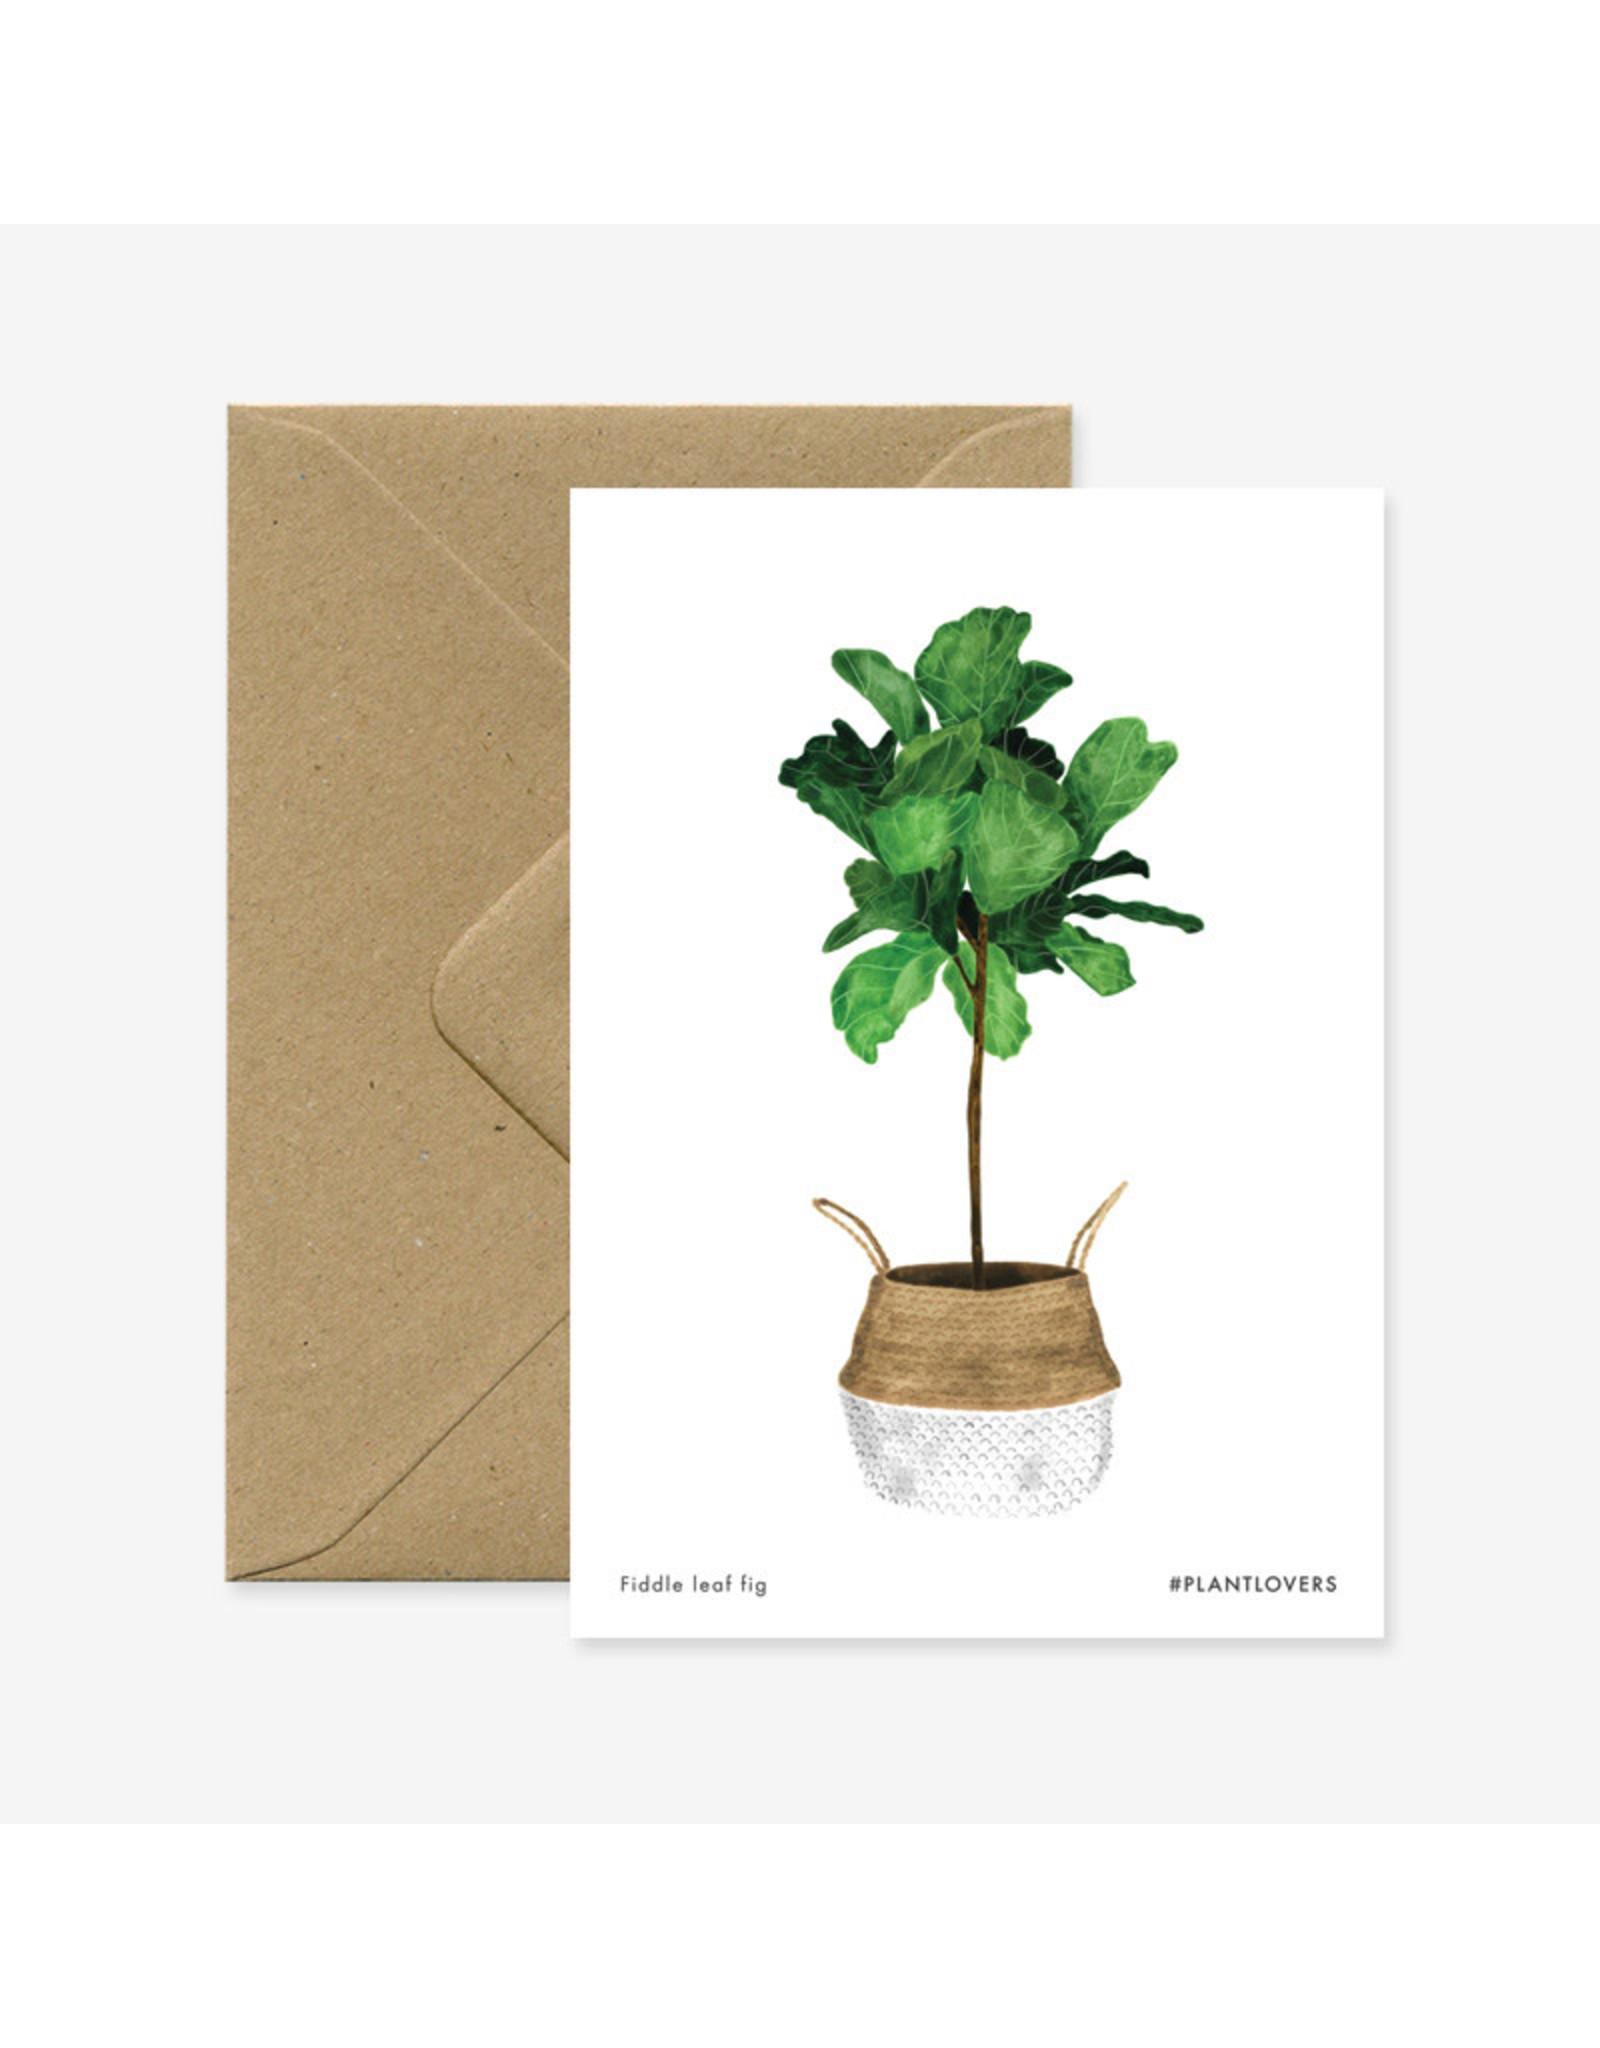 ATWS Wenskaart - Fiddle leaf fig - Dubbele kaart + Envelop - 11,5 x 16,5 - Blanco